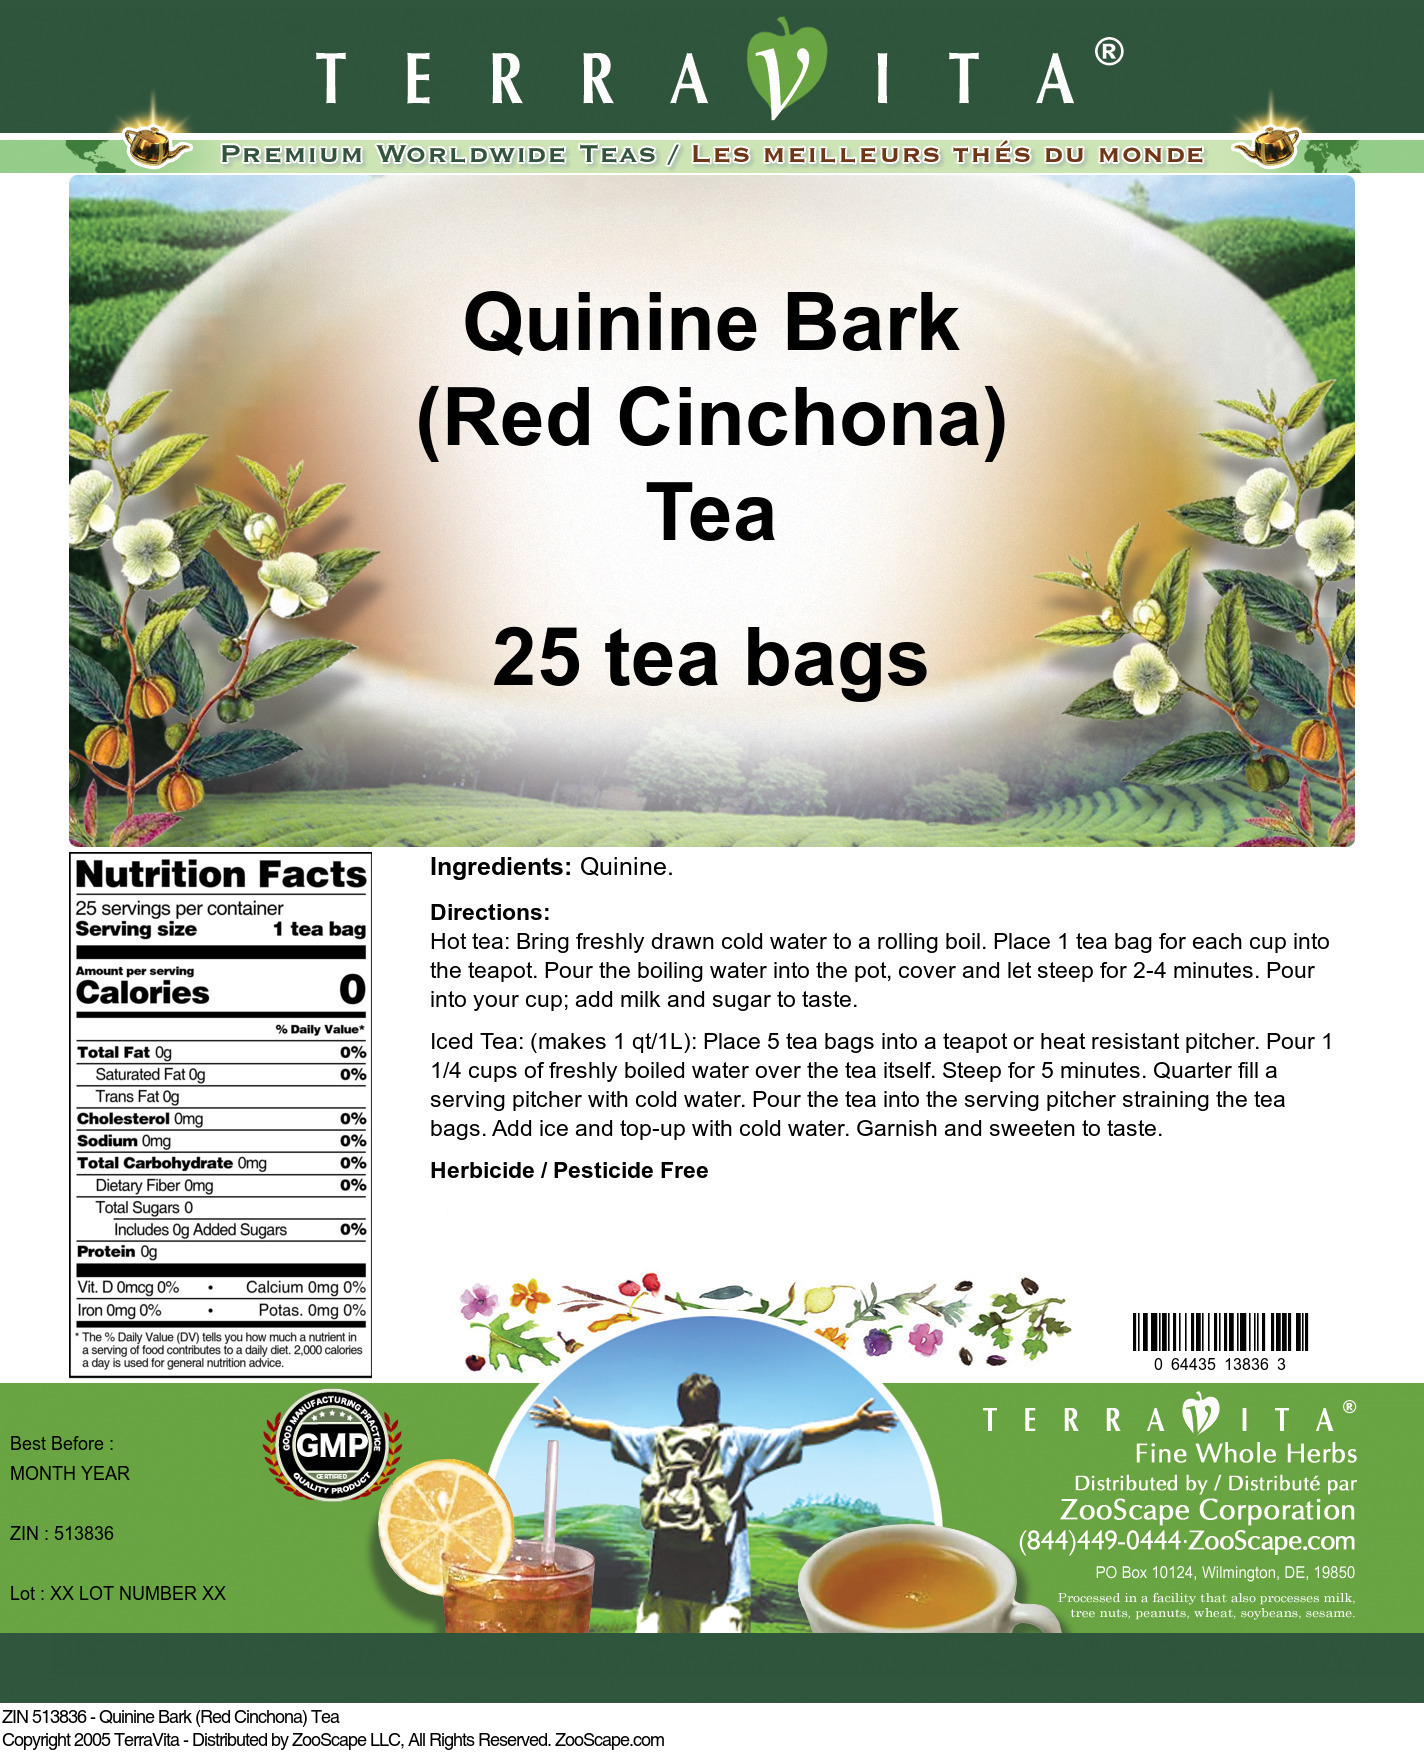 Quinine Bark (Red Cinchona) Tea